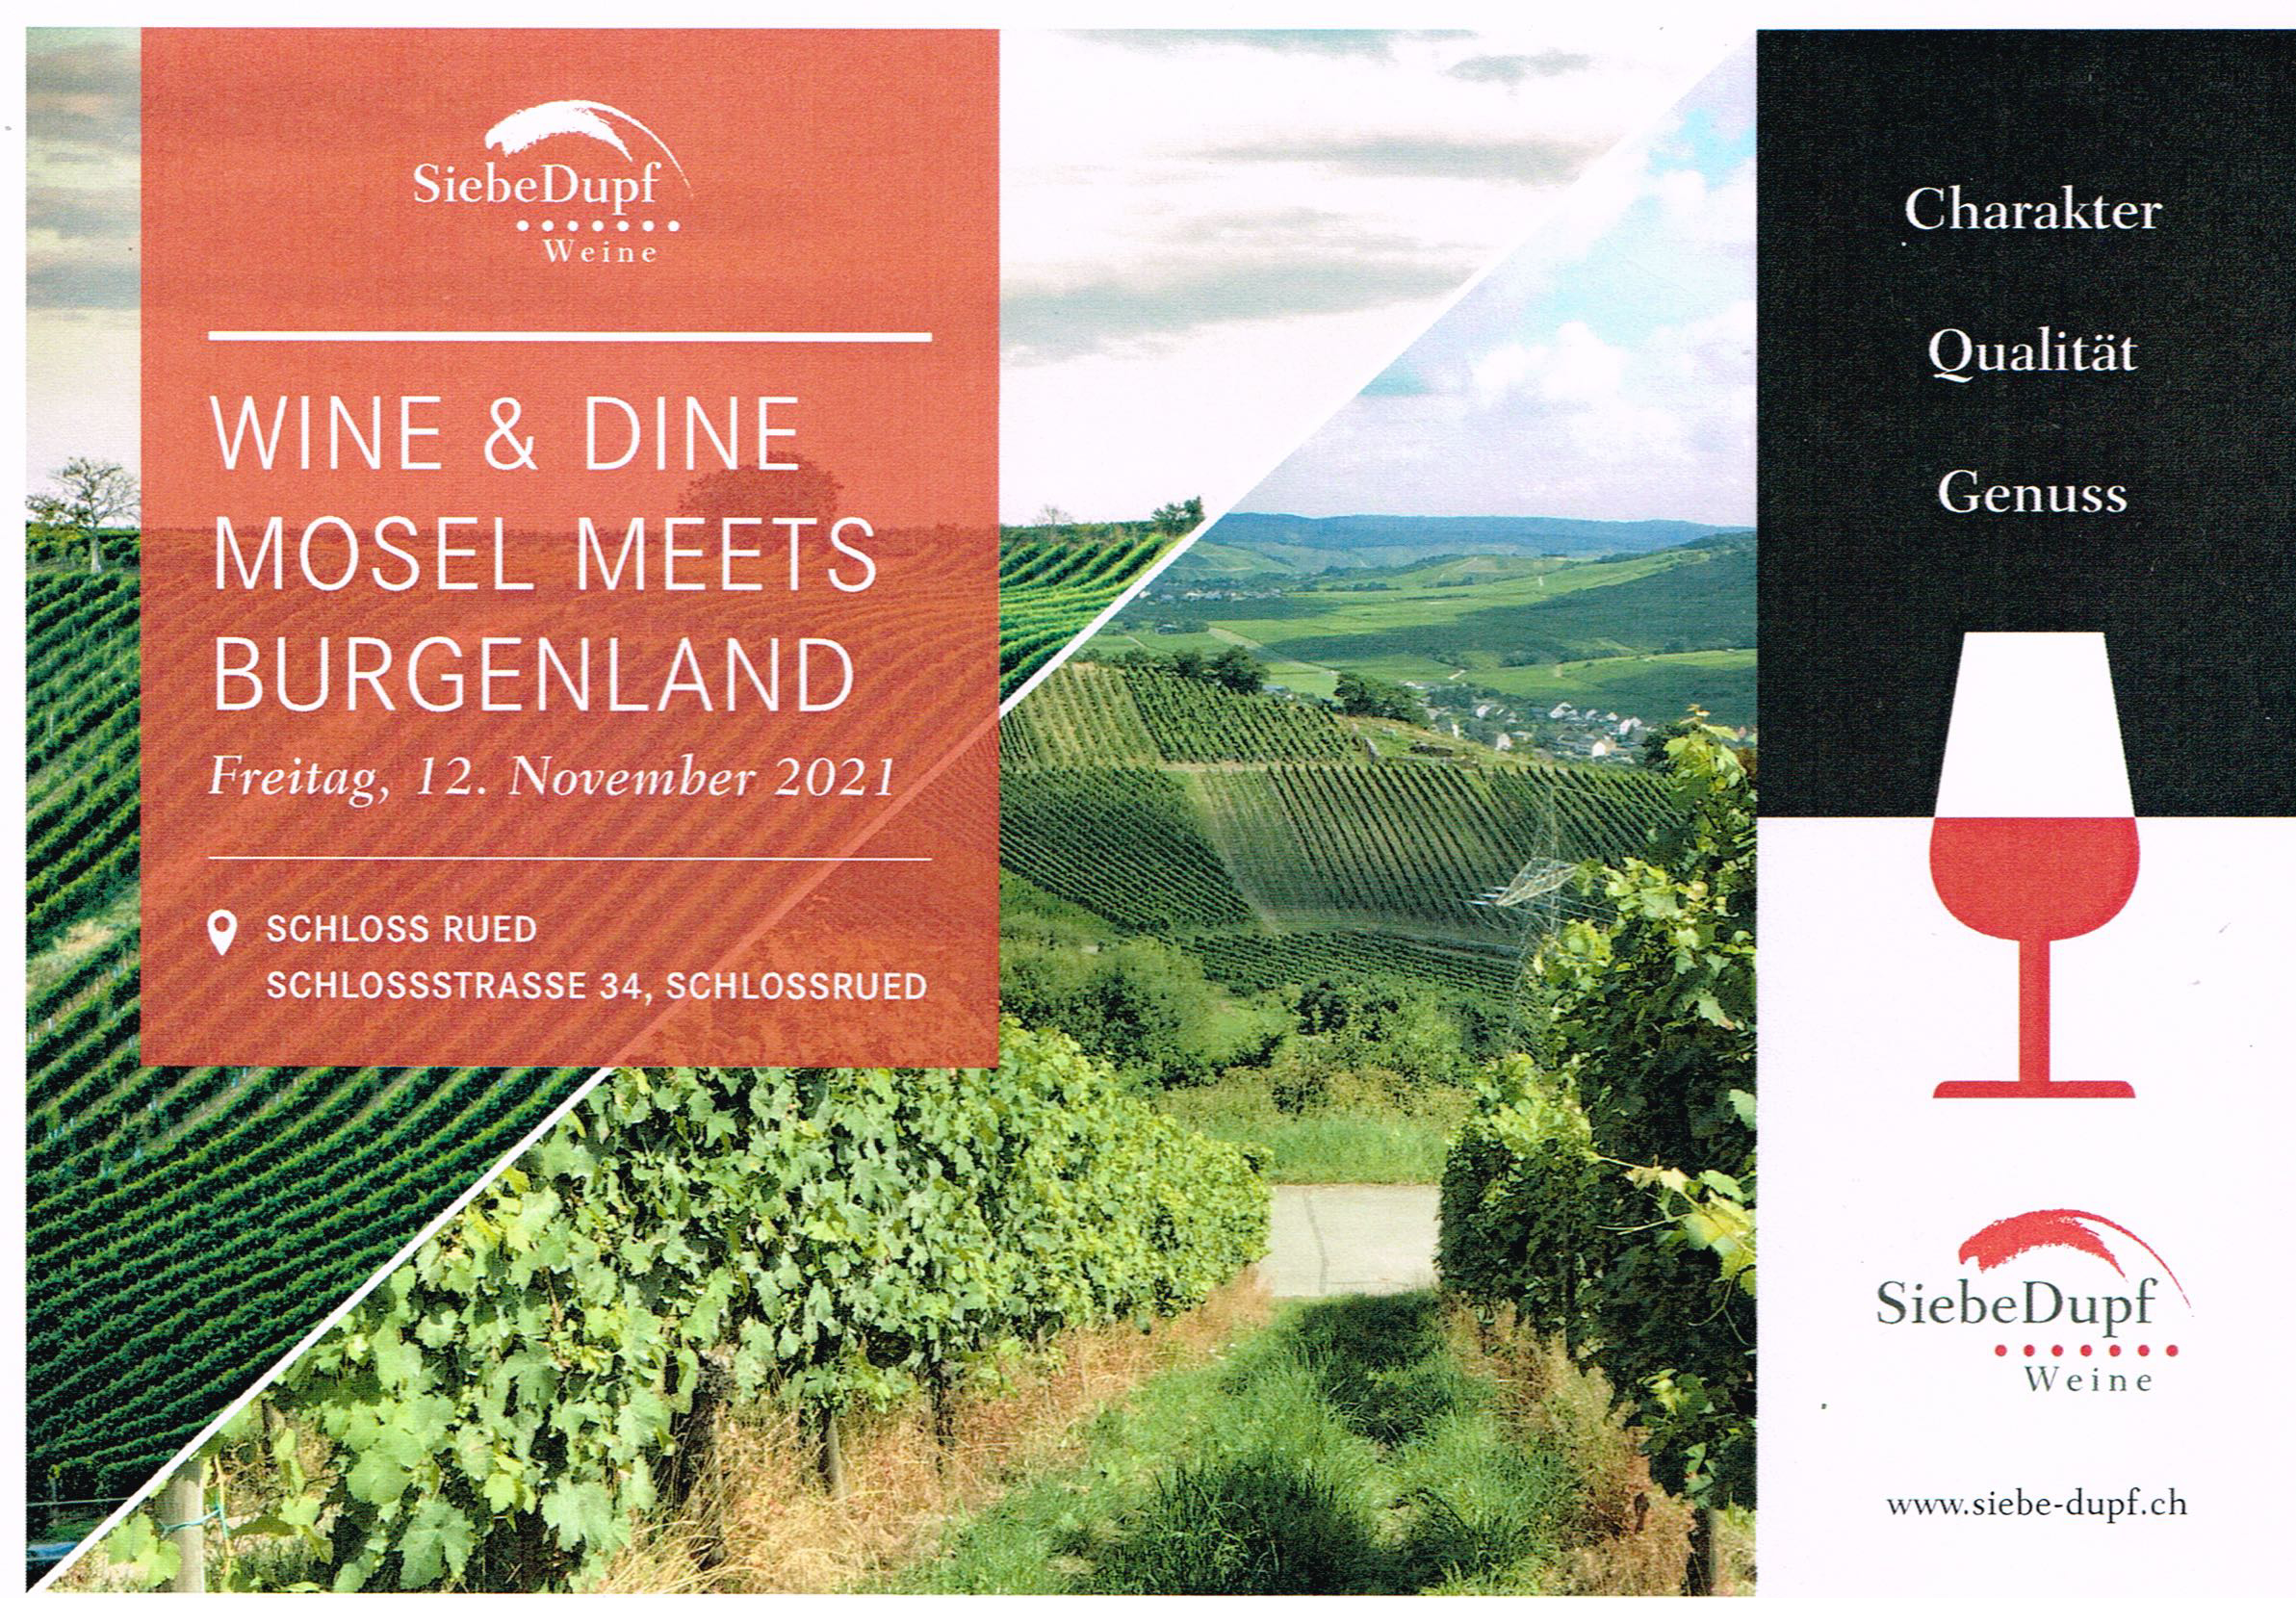 Wine&Dine - Mosel meets Burgenland